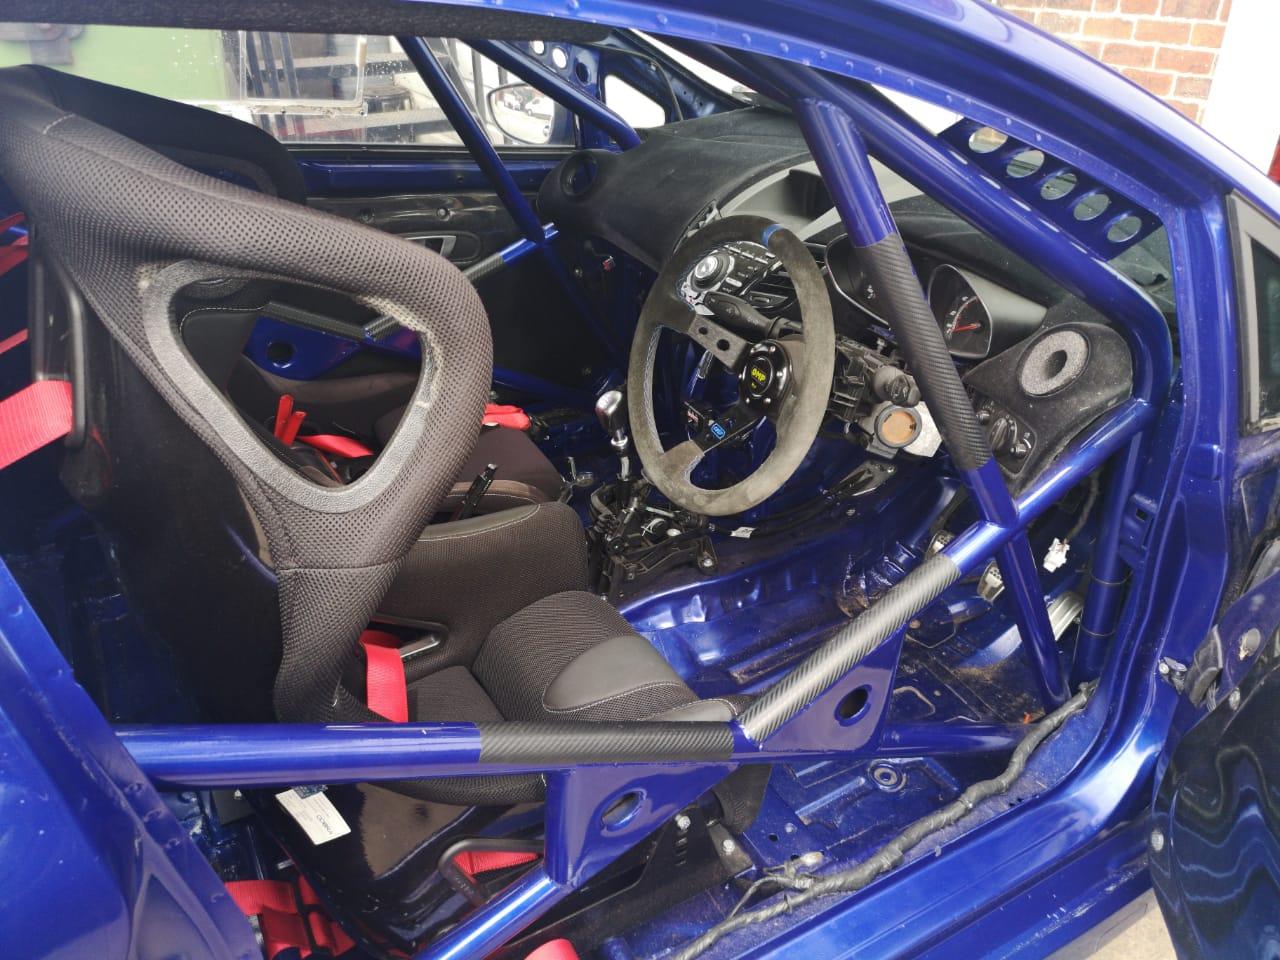 FOR SALE - Fiesta ST 180 2015 - 340BHP Track Car